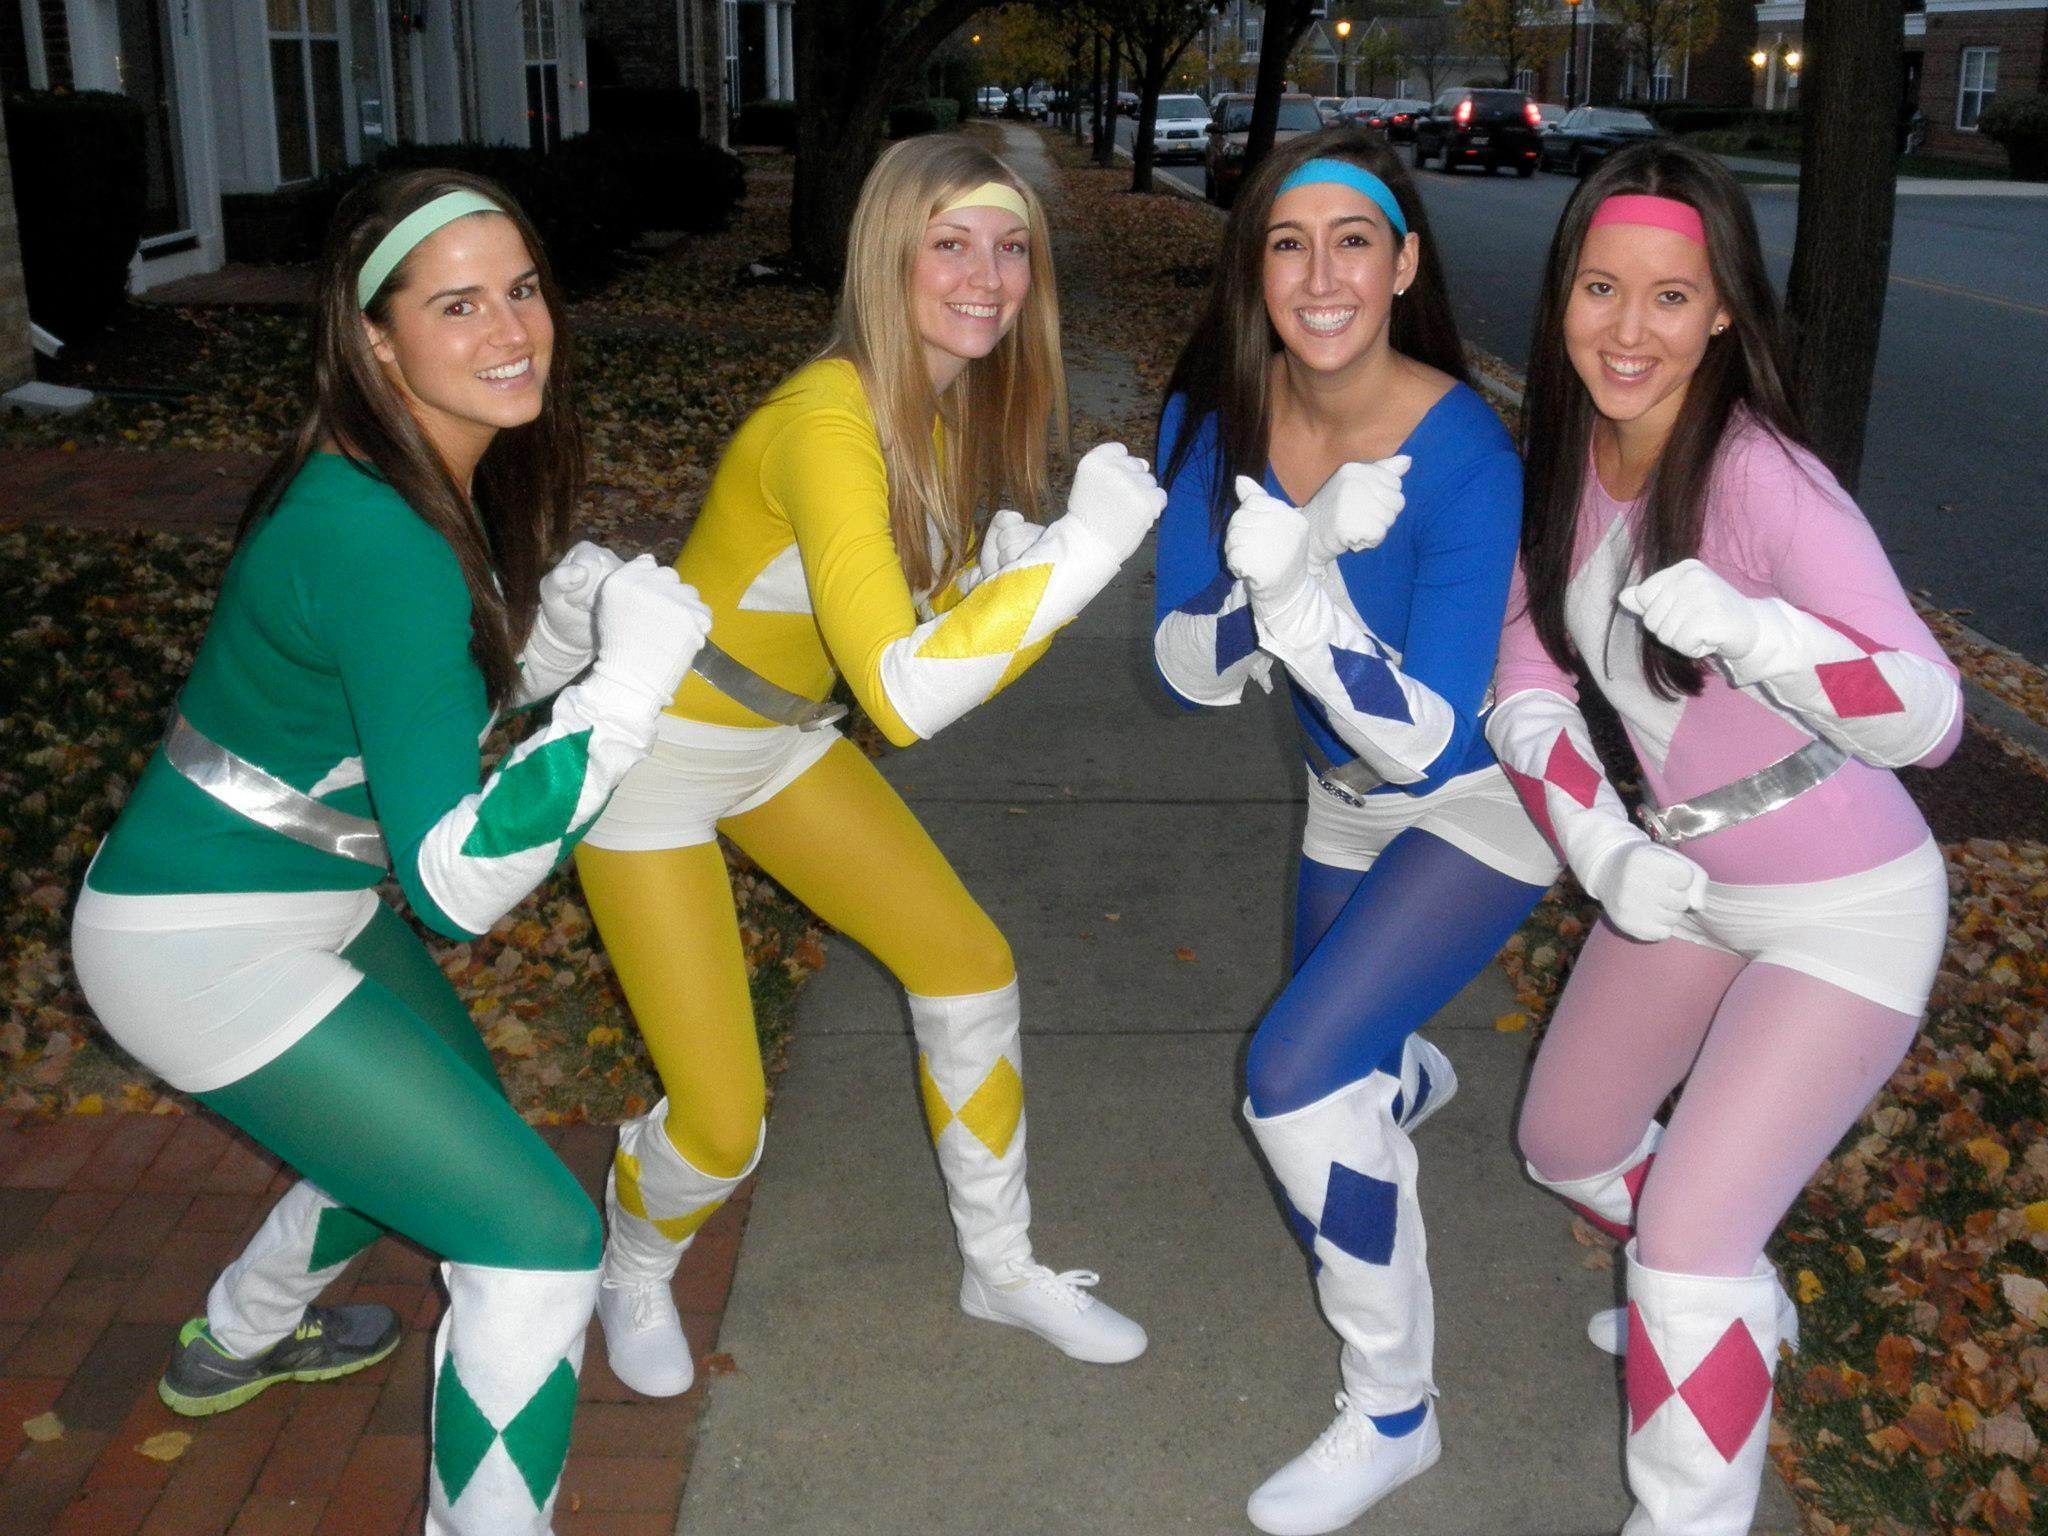 Power Rangers costume easy DIY! #DIY #POWERRANGERS #HALLOWEEN Body ...